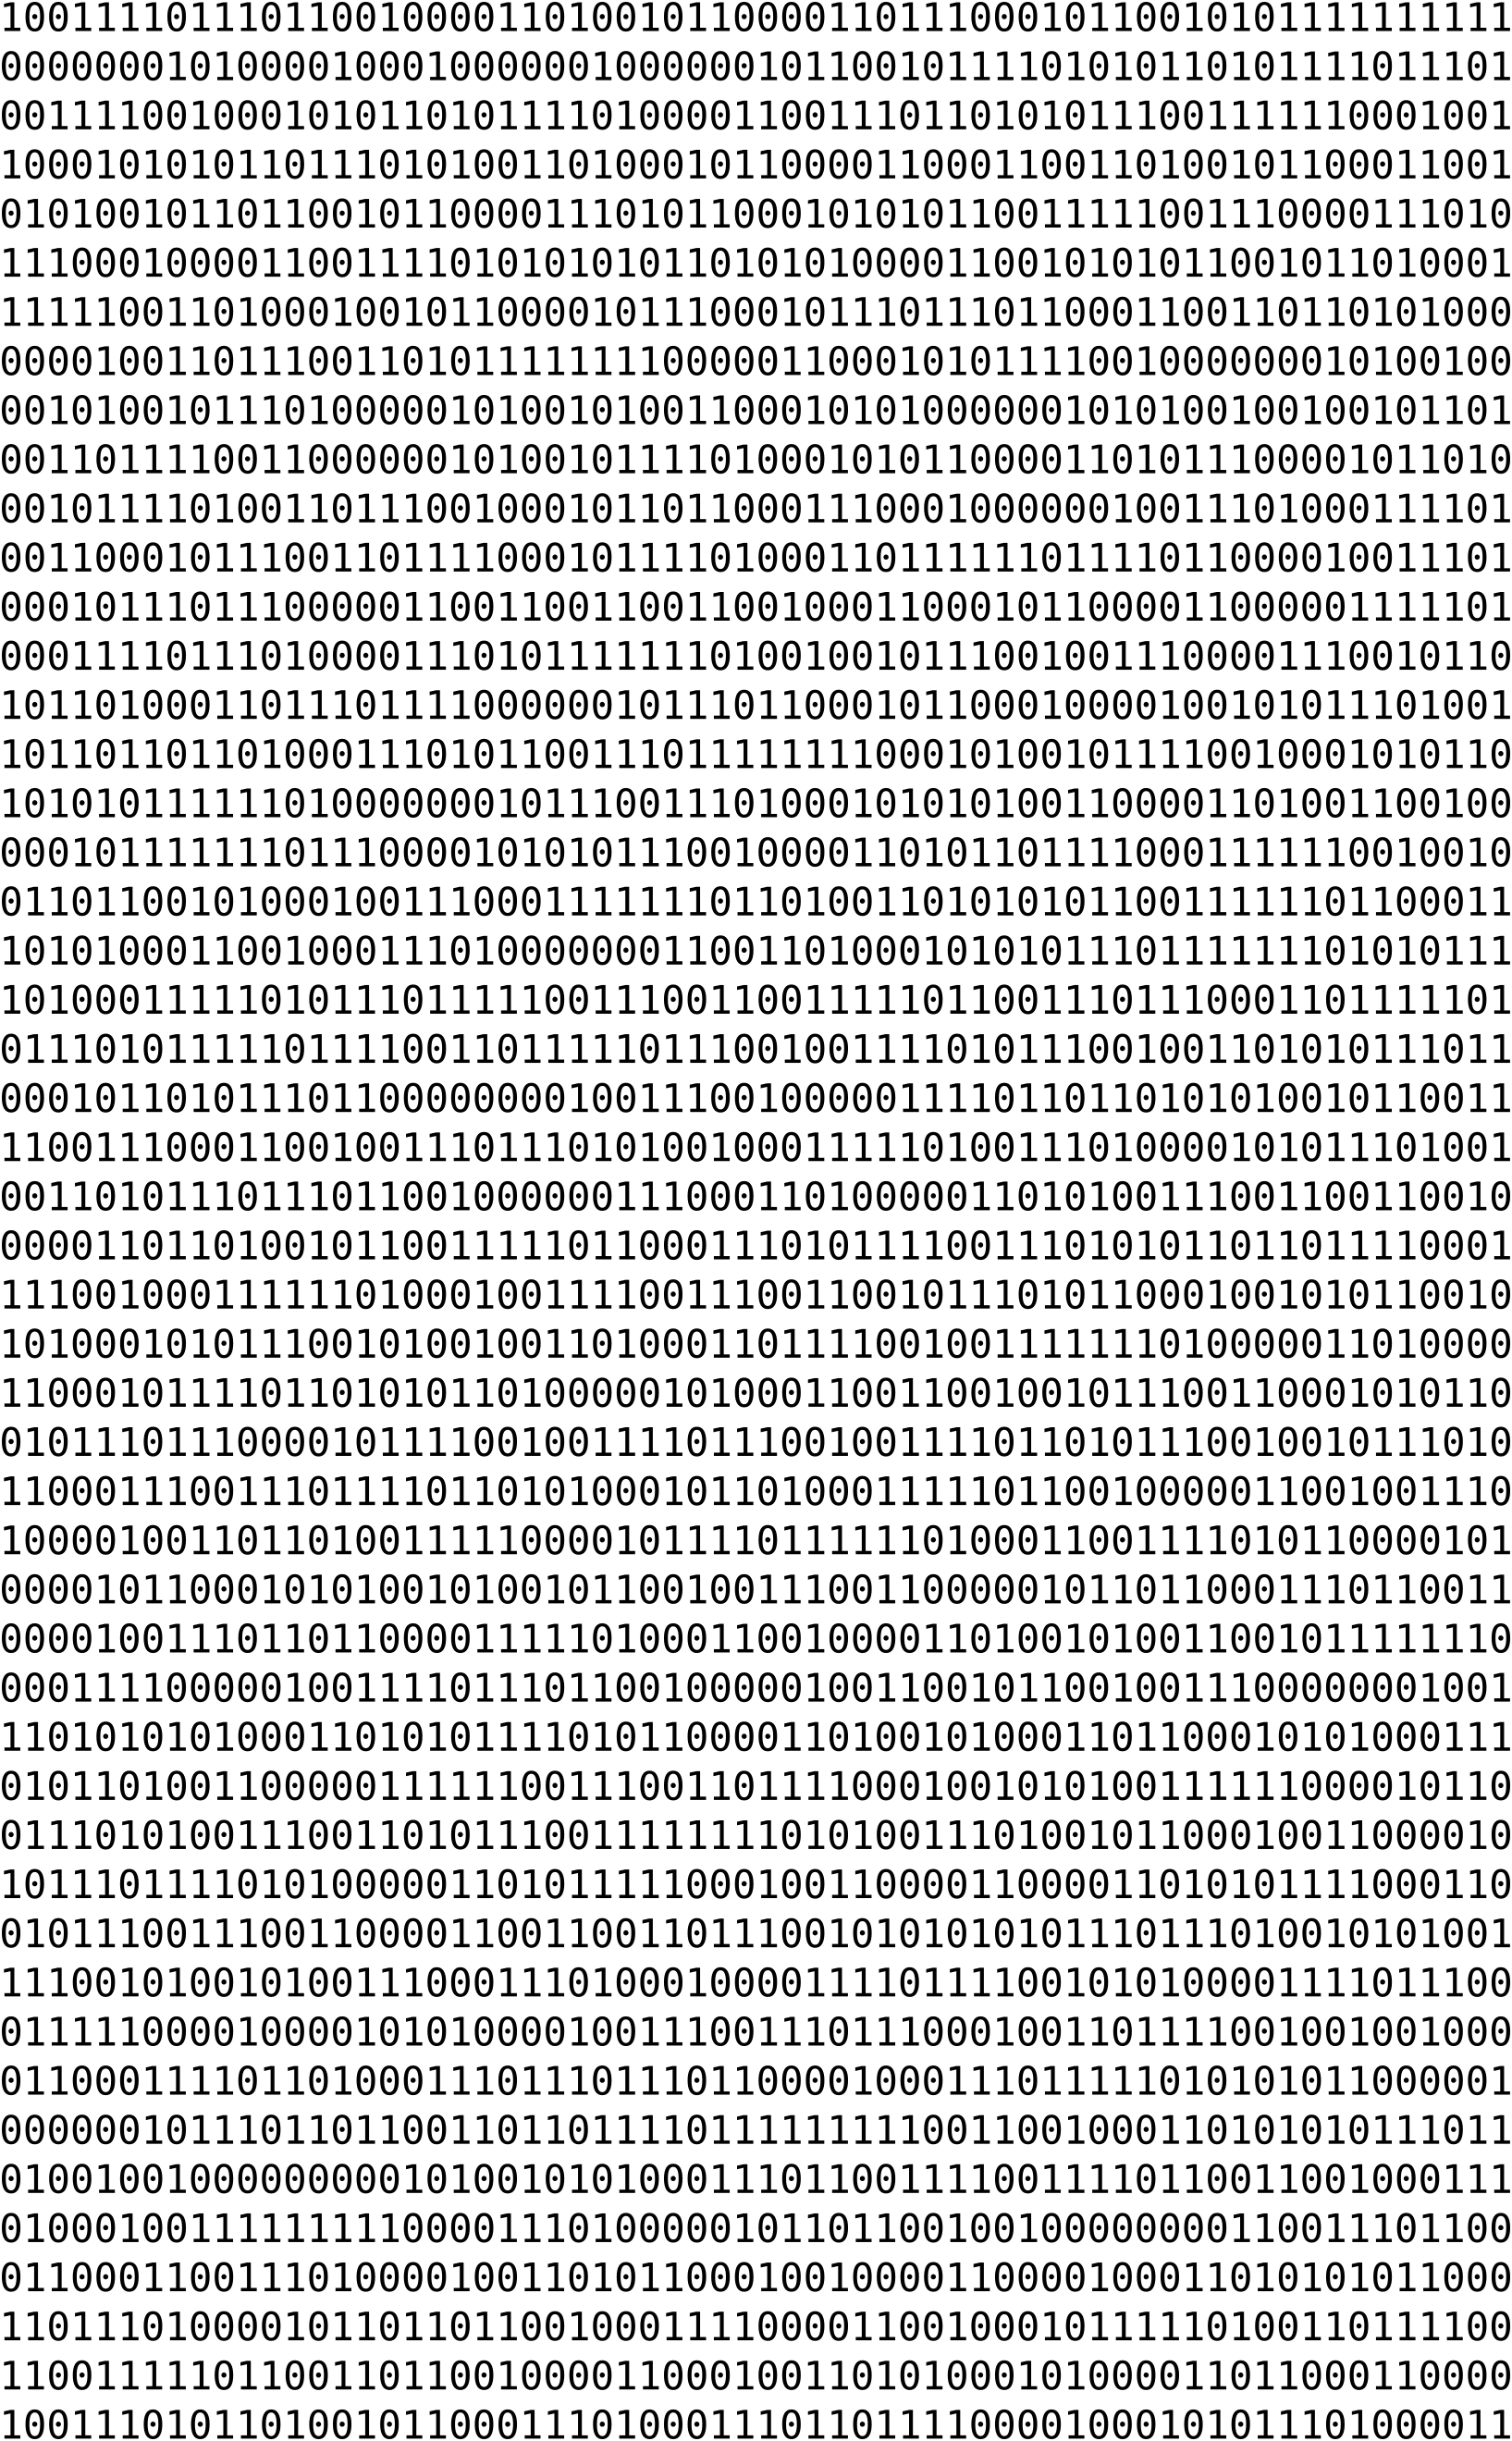 Binary clipart matrix Code Clipart Texture Texture Rooweb